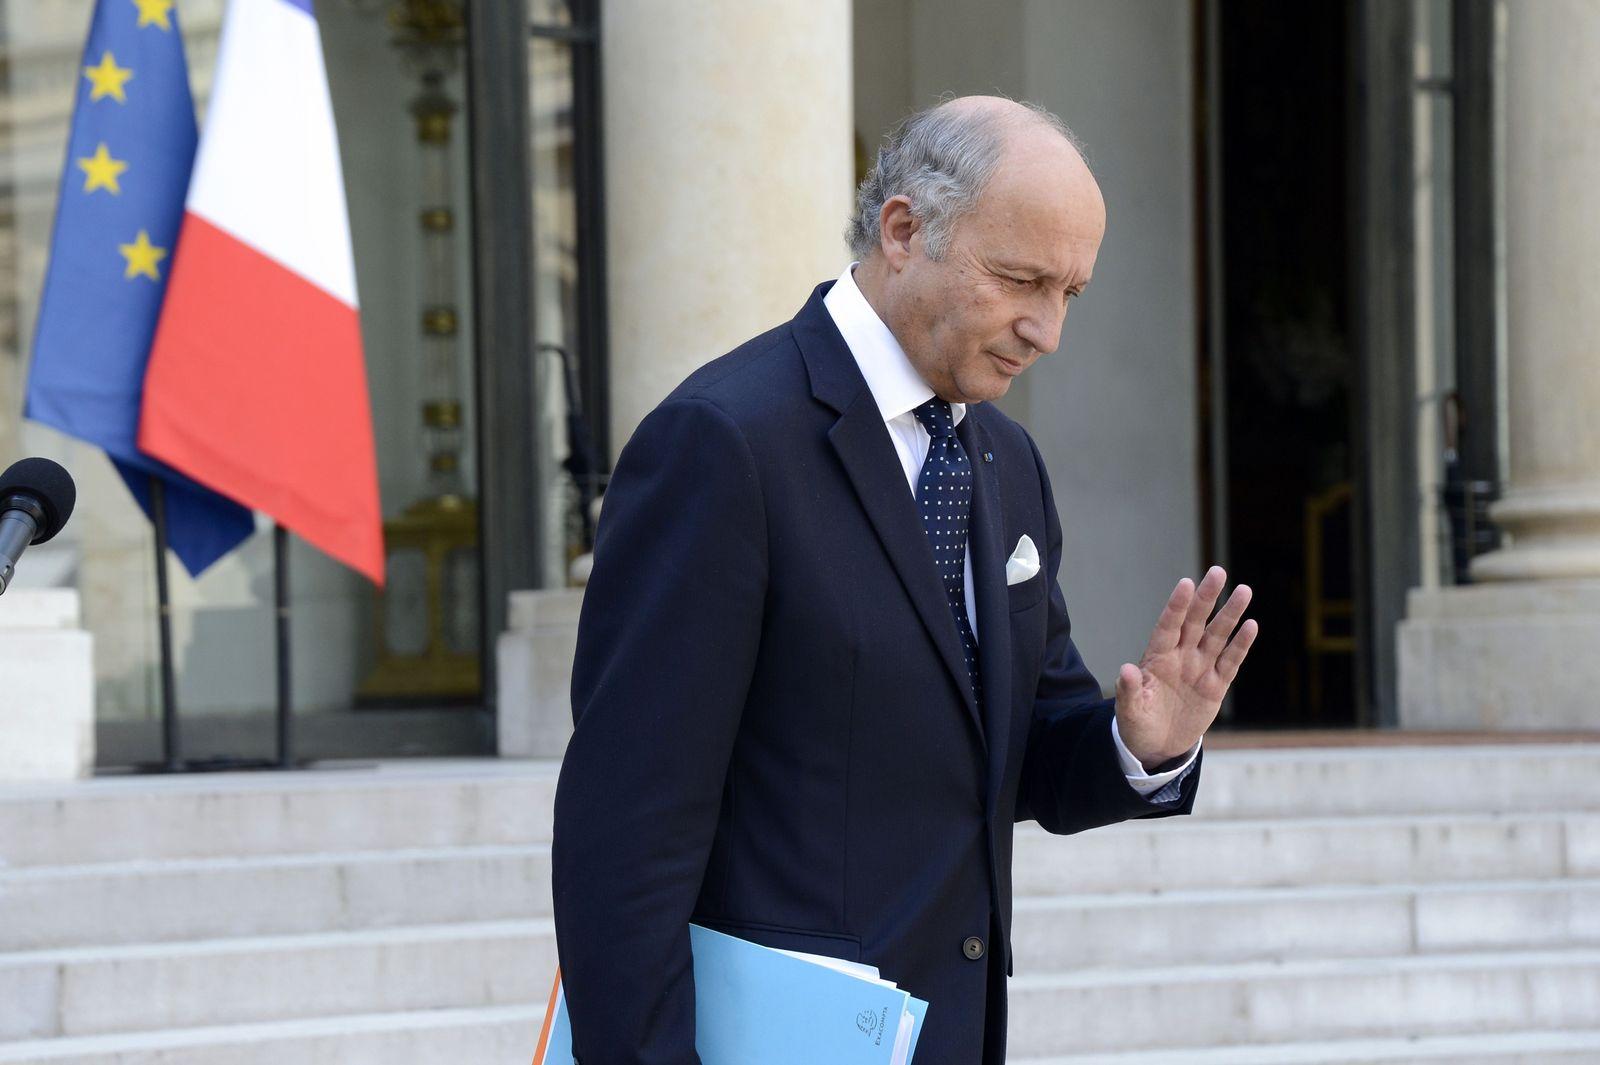 FRANCE-SYRIA-CONFLICT-POLITICS